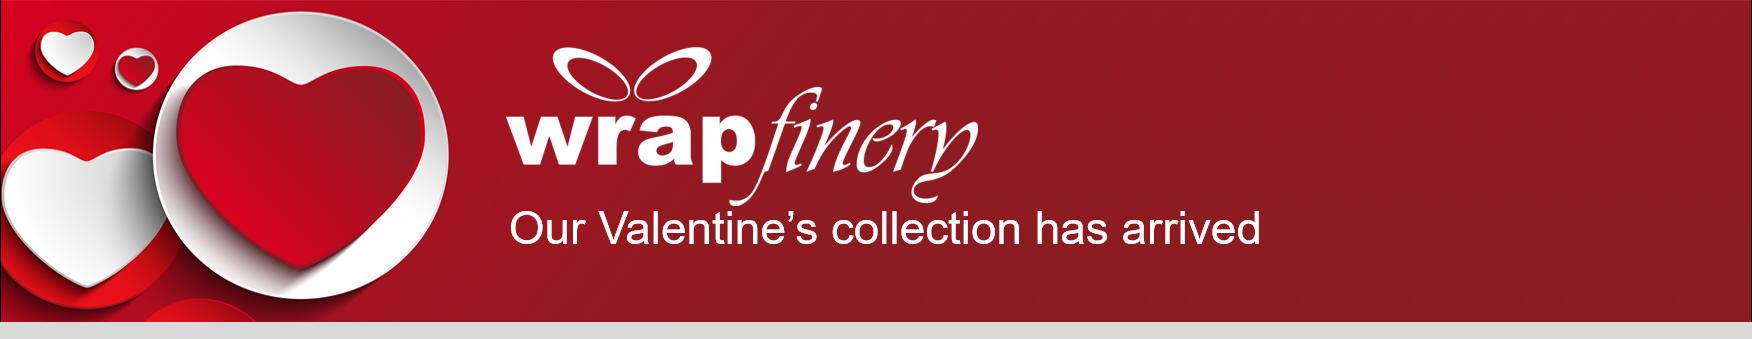 WRAPfinery Valentines Banner Heading